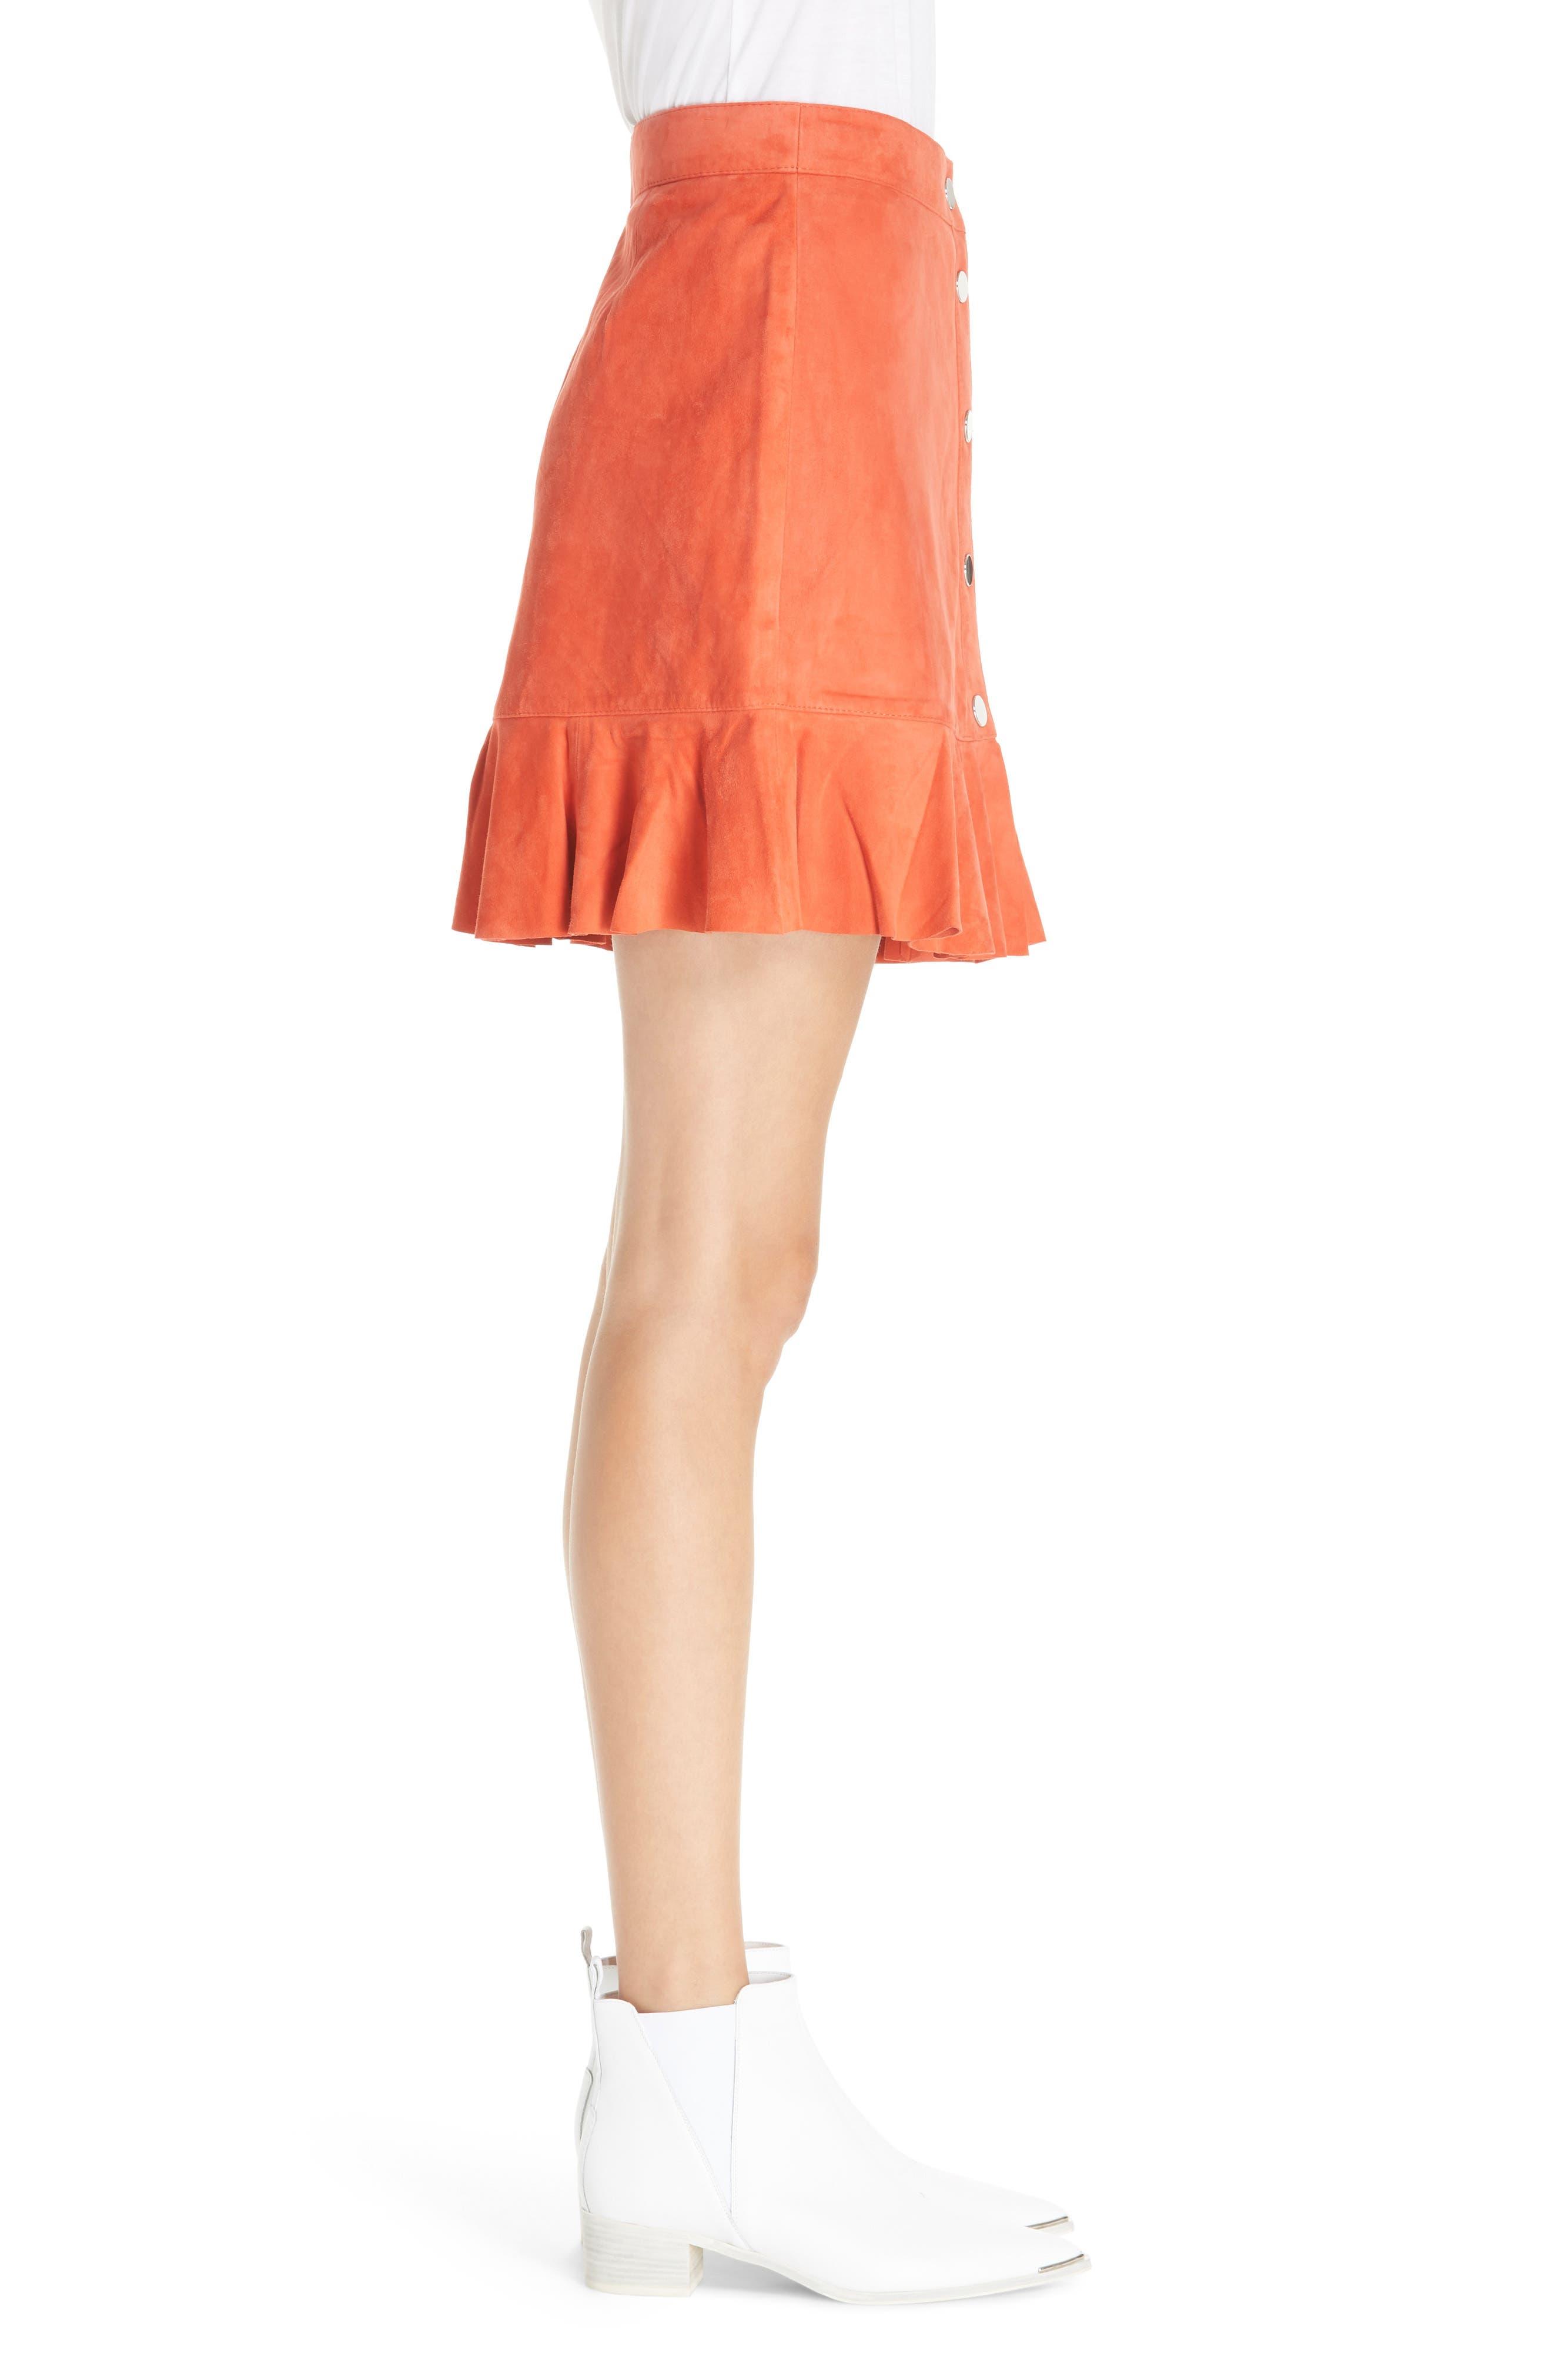 GANNI,                             Salvia Suede Skirt,                             Alternate thumbnail 3, color,                             800